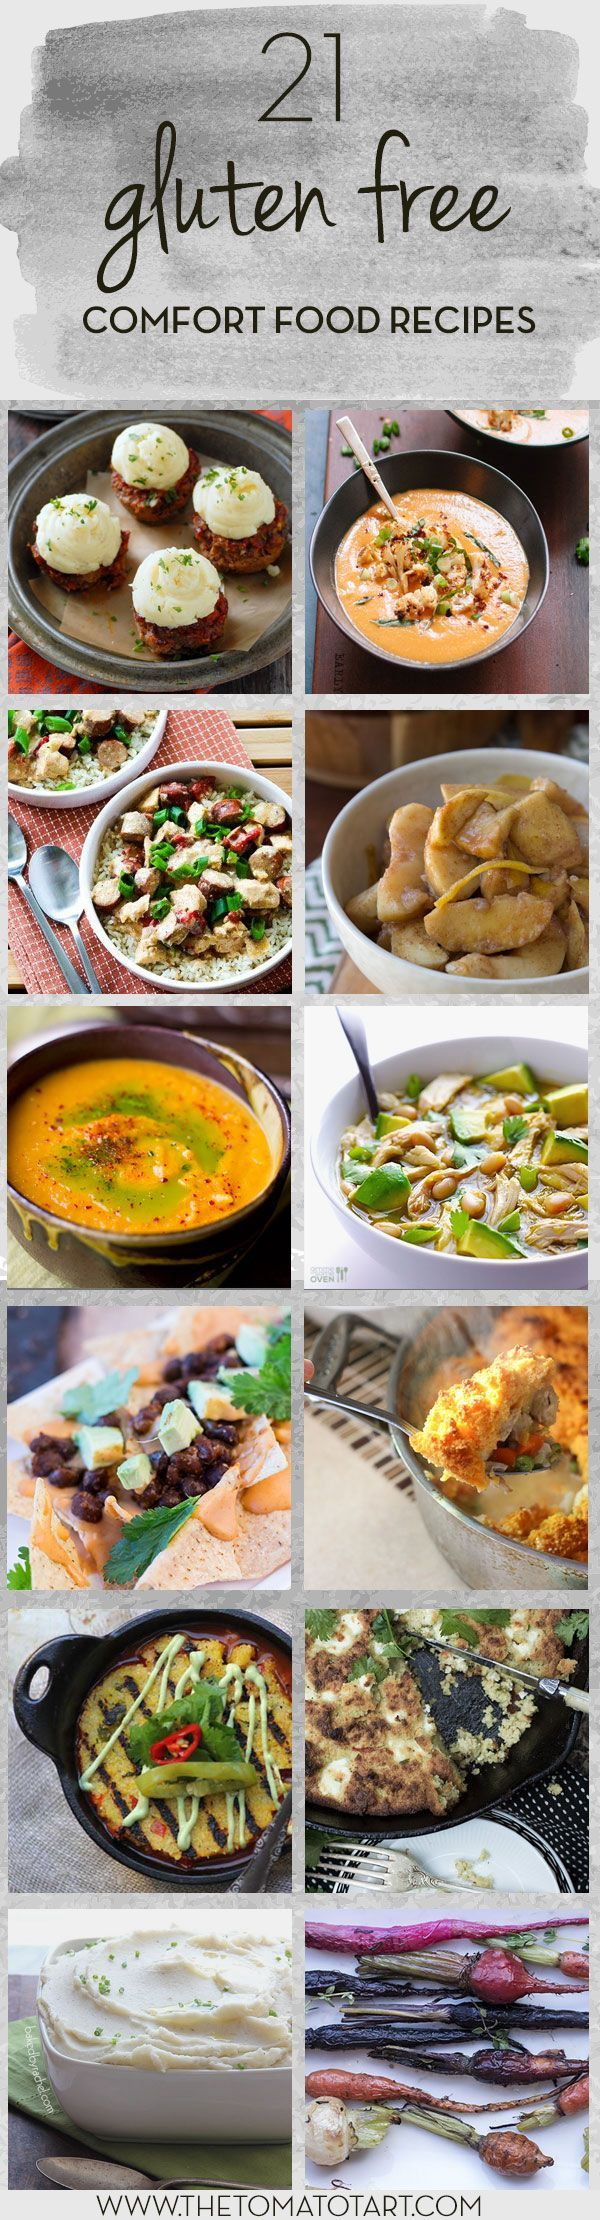 21 Gluten Free Comfort Food Recipes including Gluten Free Mac and Cheese, Swedish Meatballs, Creamy Vegan Carrot Soup, Chicken Pot Pie, and Nachos! #kombuchaguru #glutenfree Also check out: http://kombuchaguru.com